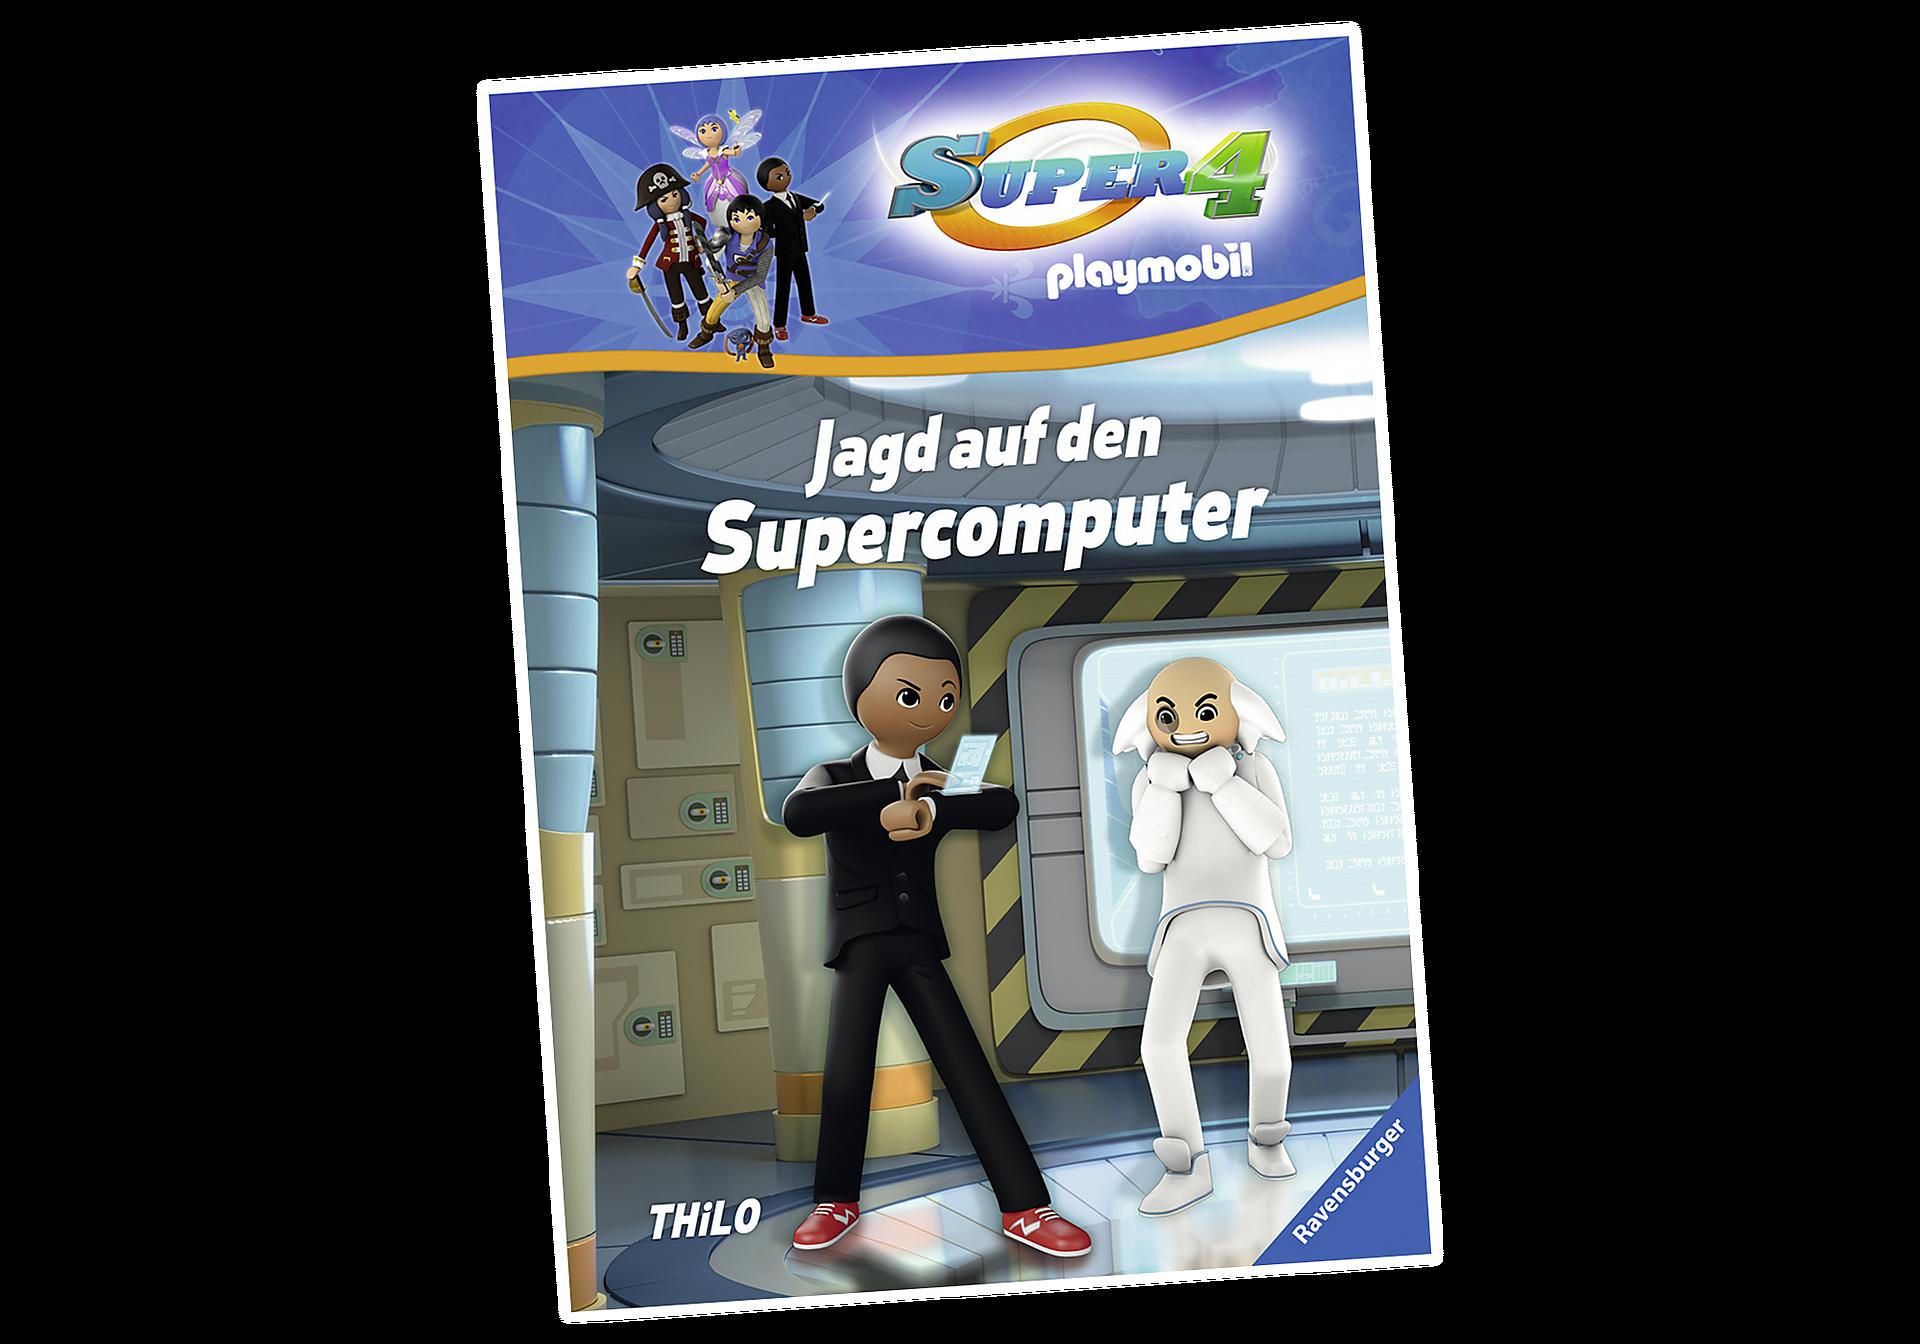 80486 Super 4: Erstleser - Jagd auf den Supercomputer zoom image1